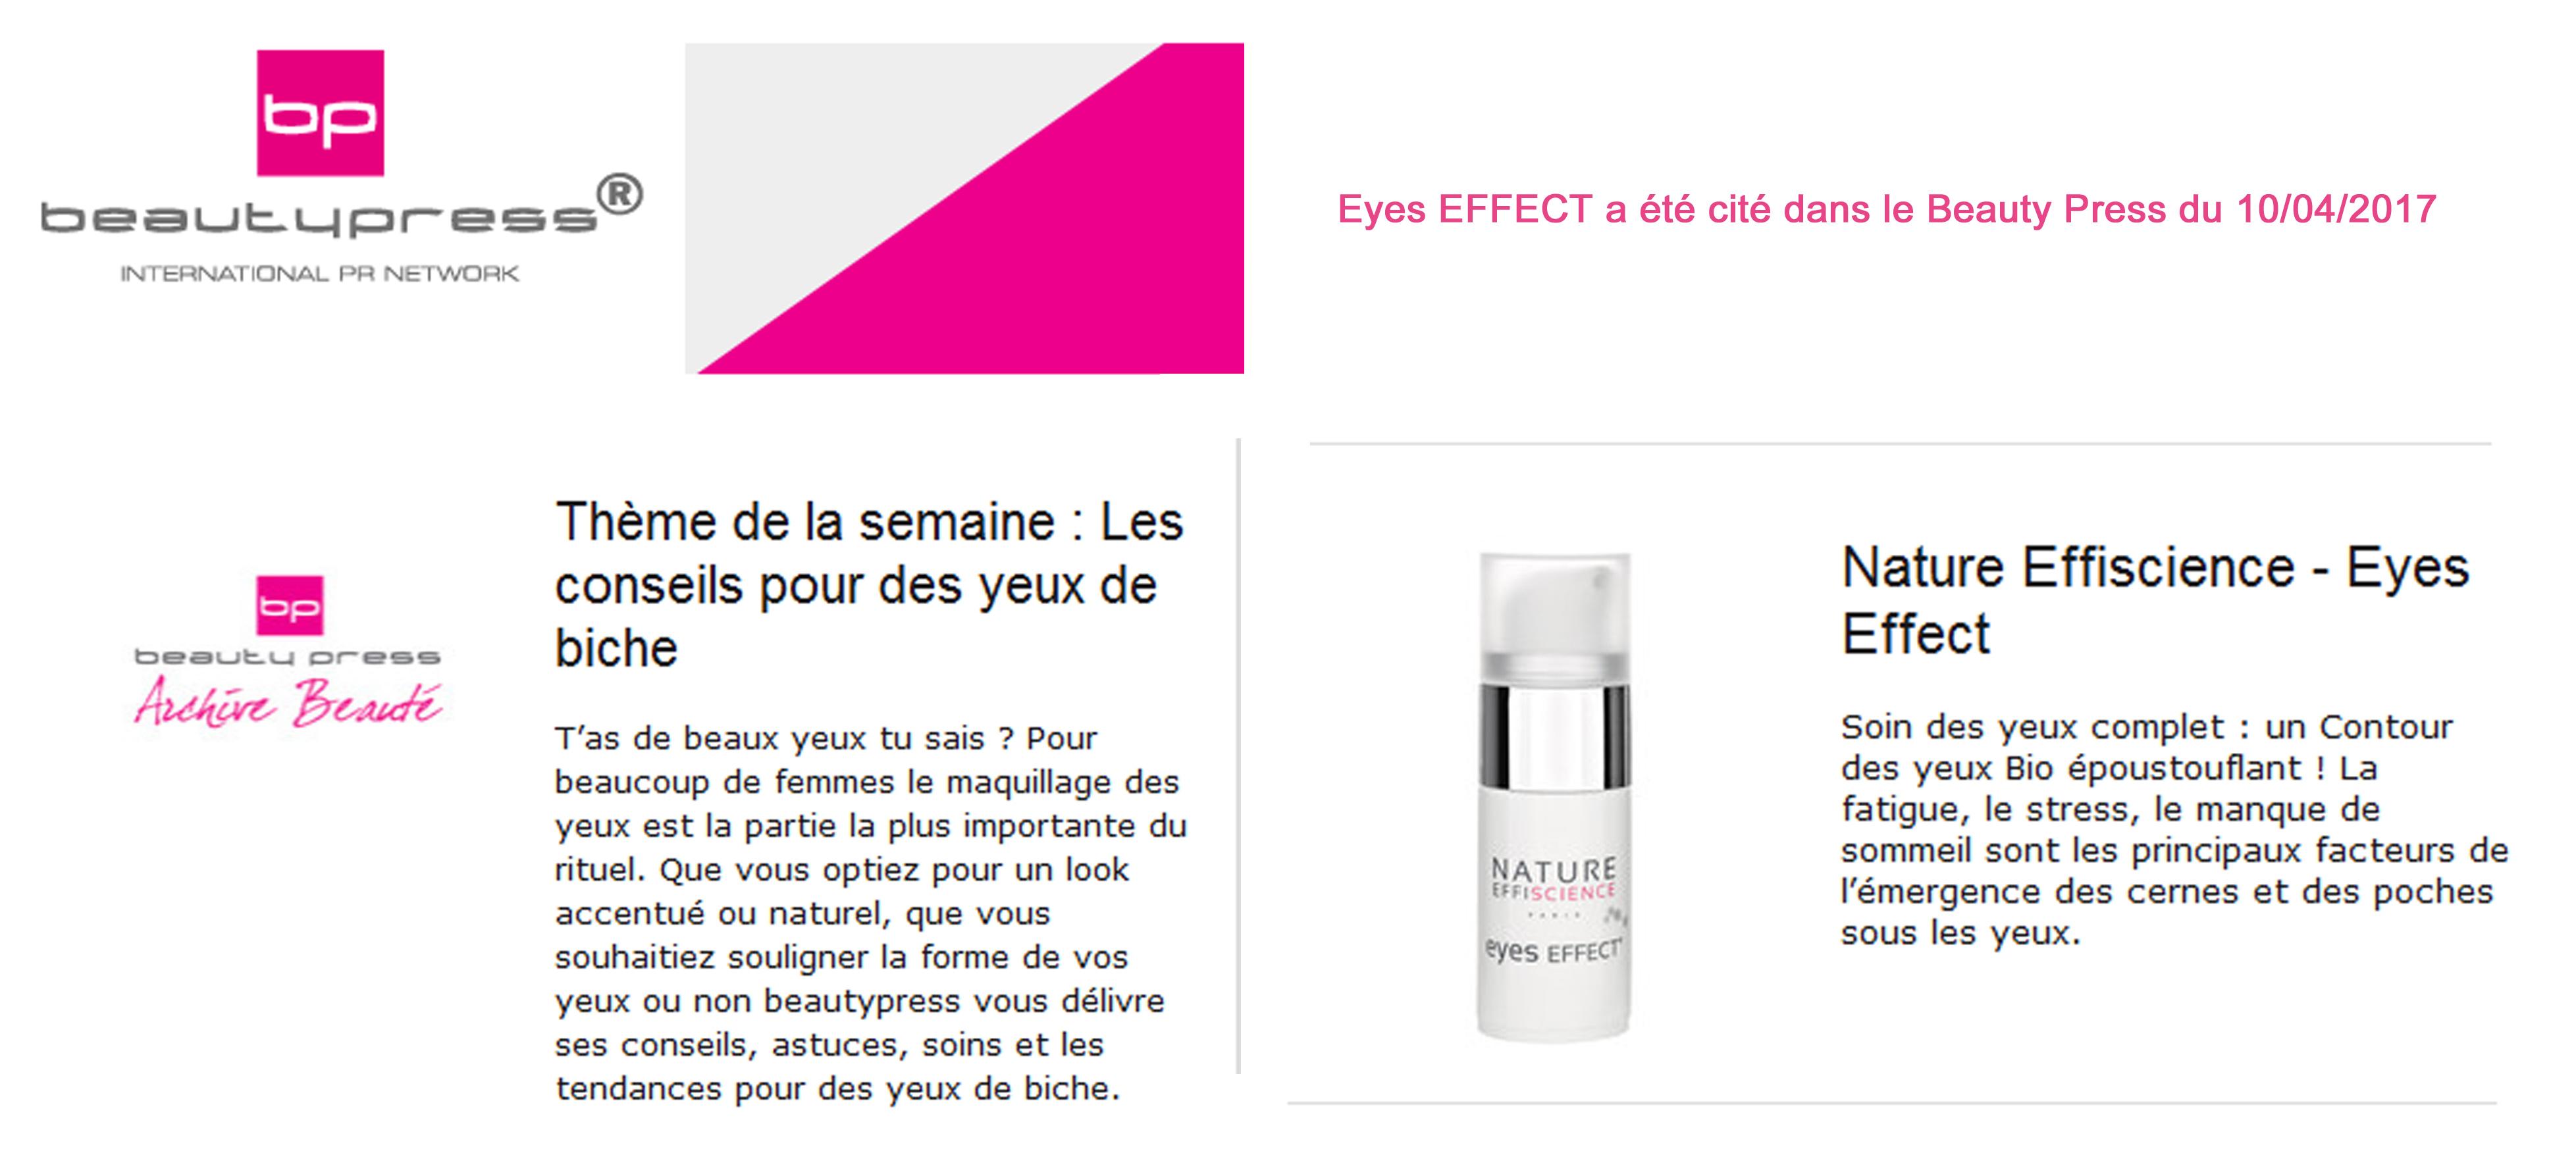 Eyes Nature Effiscience dans Beauty Press